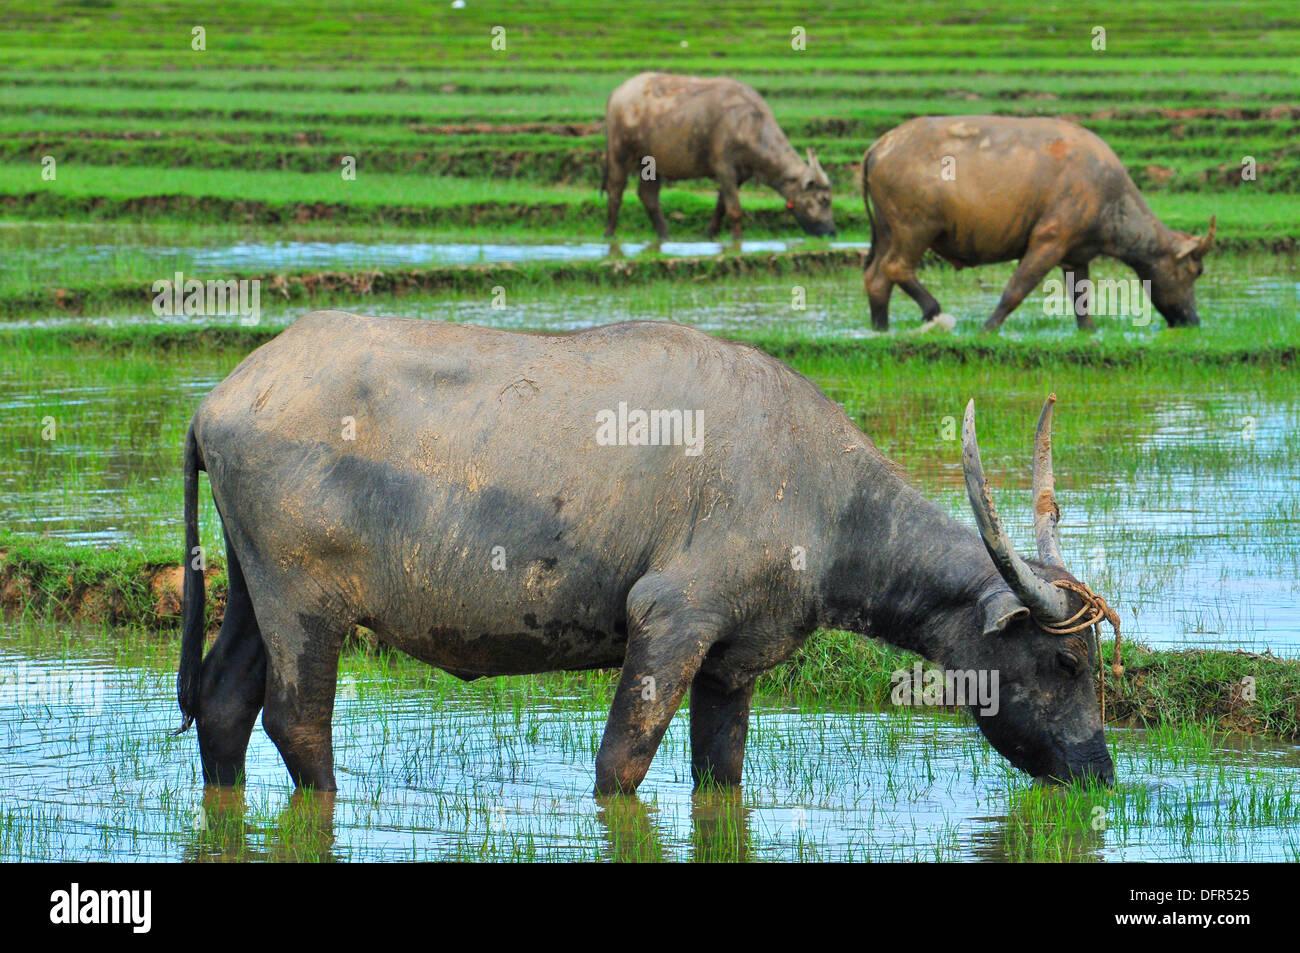 Domestic animals in Thailand - Three Asian water buffaloes feeding in the rice field (Koh Yao Noi, Phang-Nga) - Stock Image